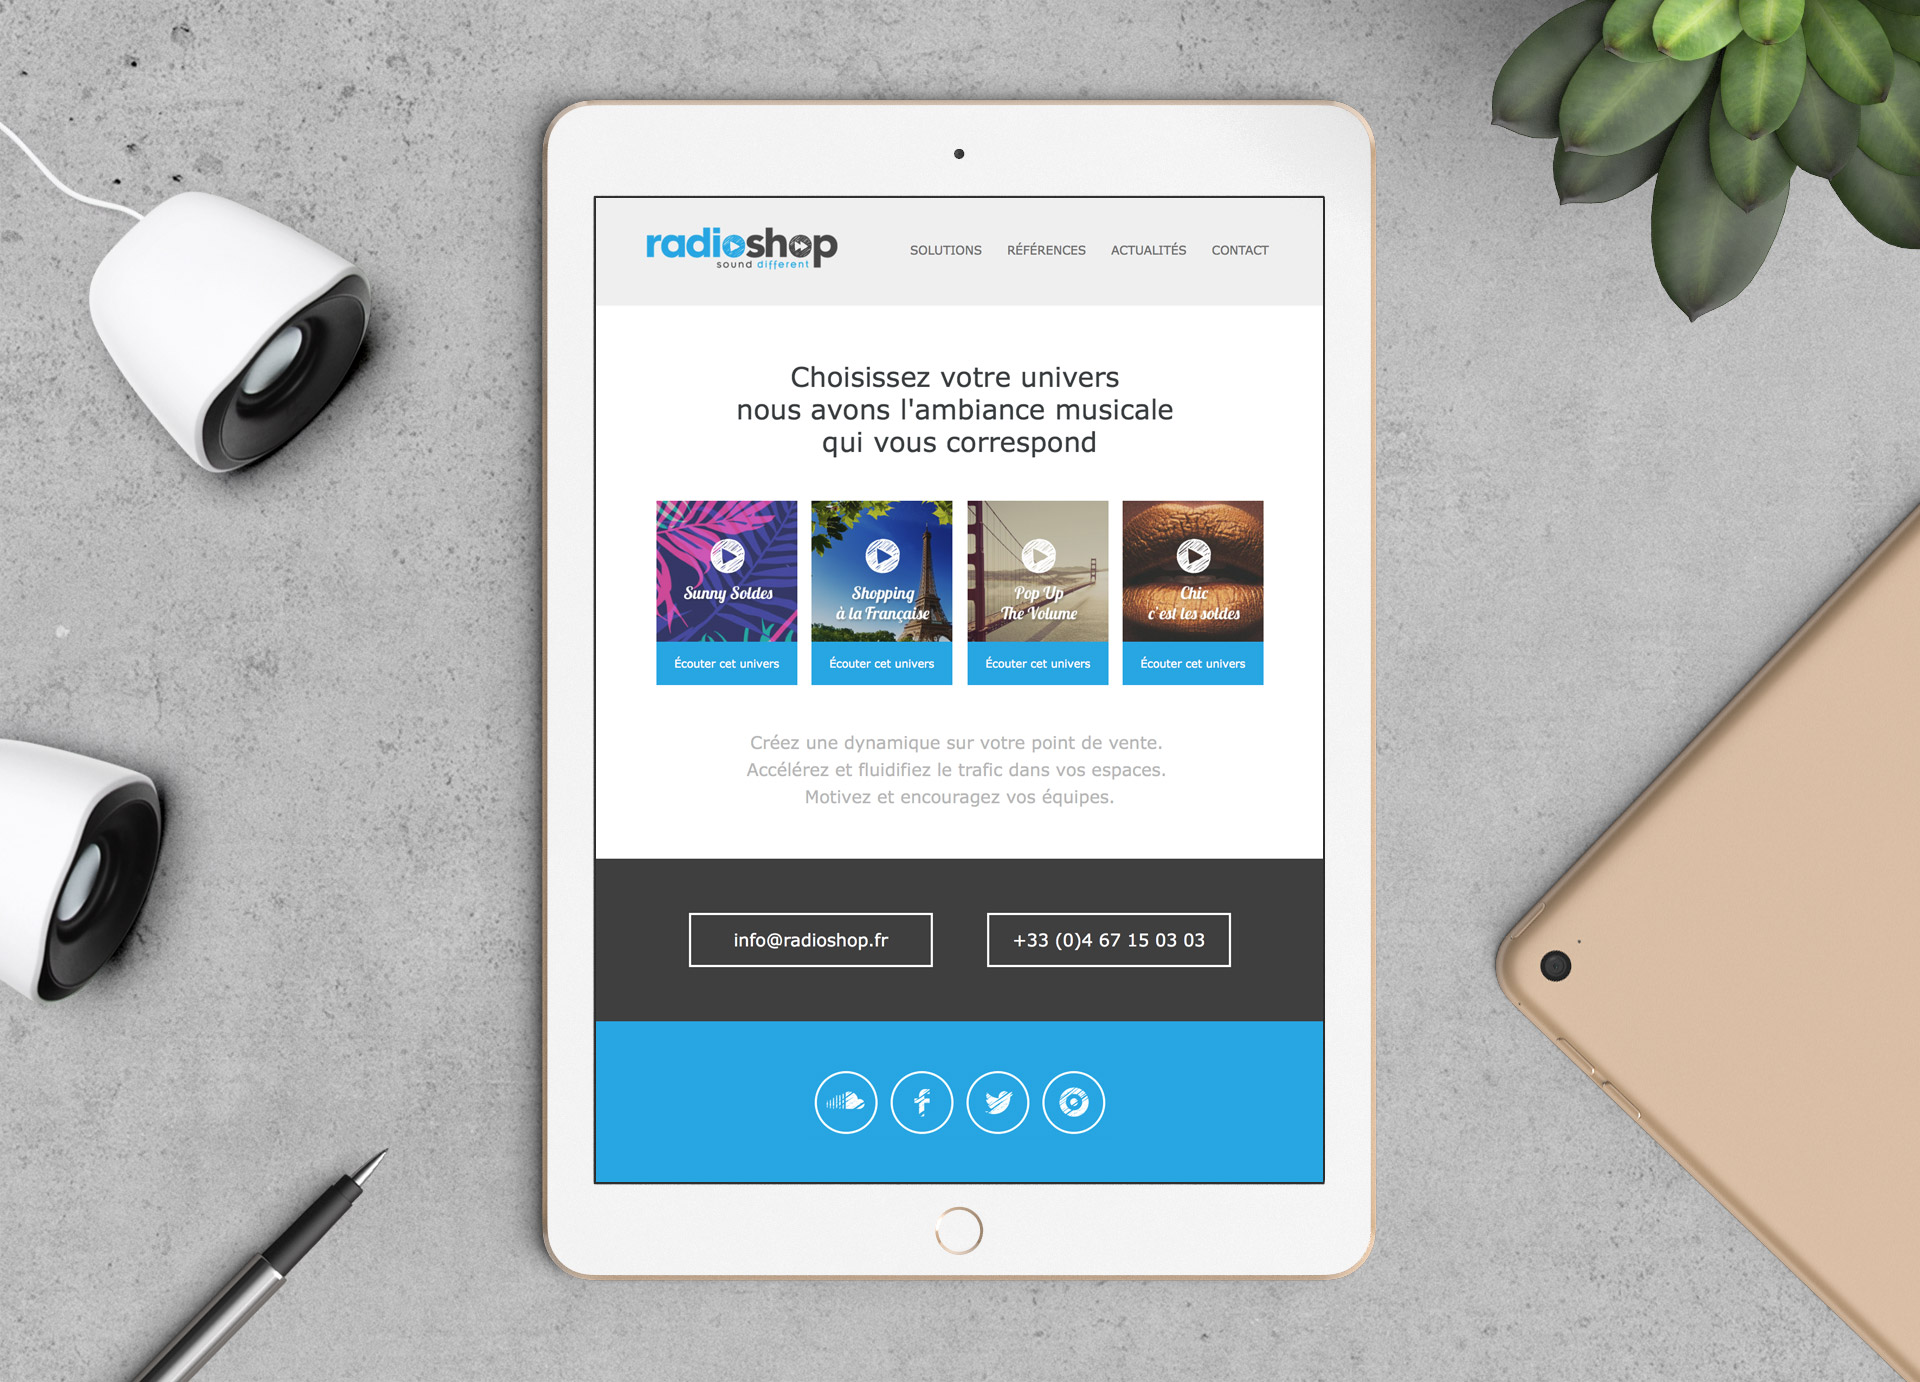 radioshop-creation-emailing-newsletter-design-graphiste-montpellier